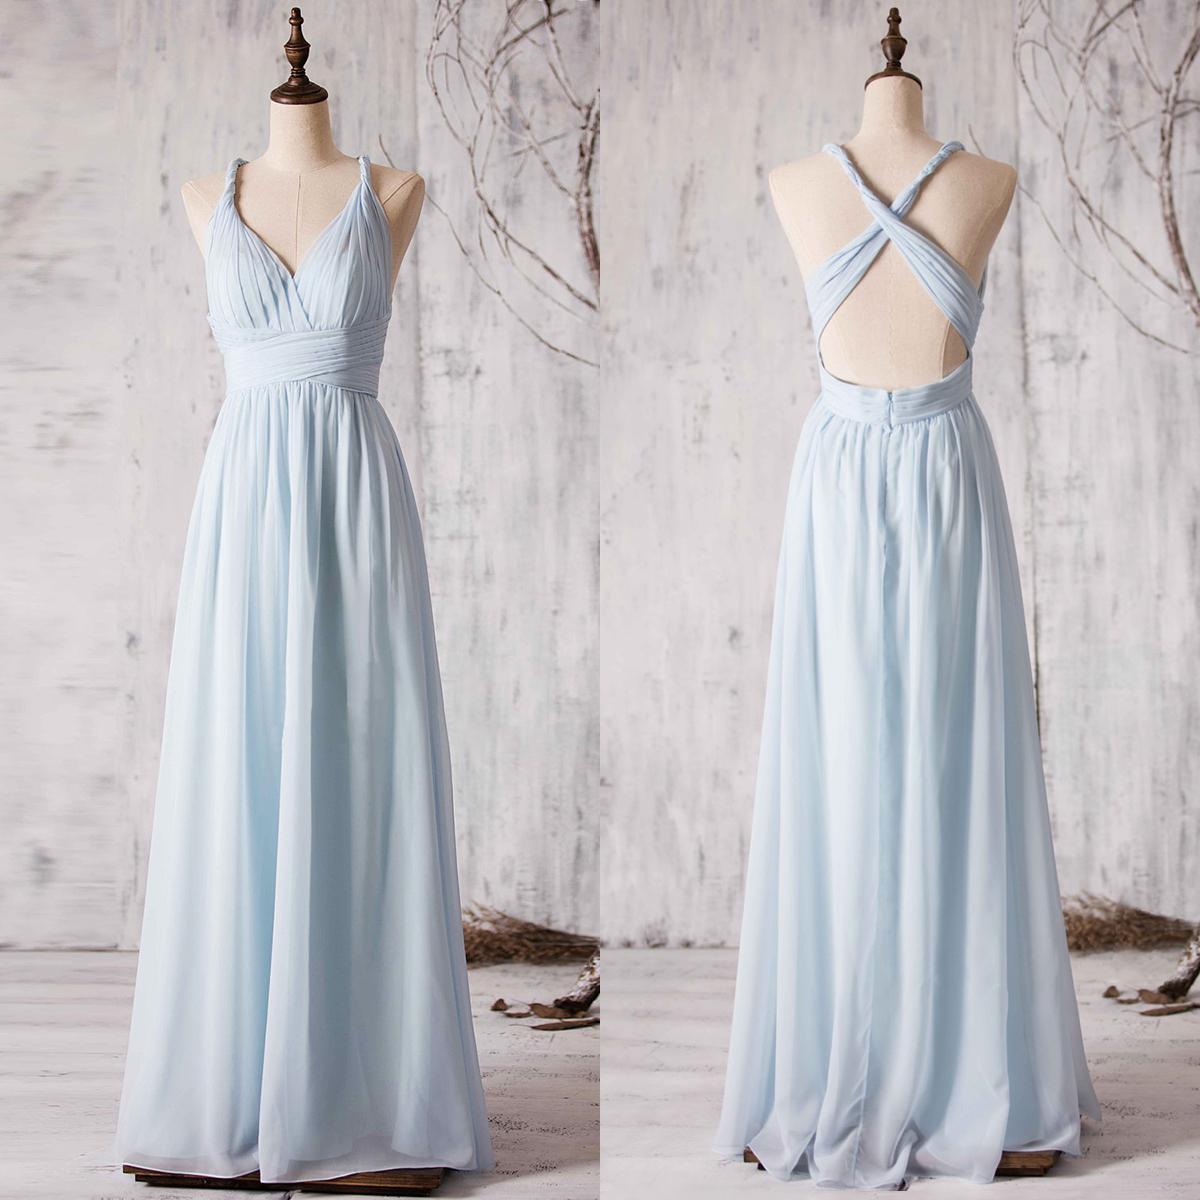 aaaf6508ca1 V-neck Chiffon Bridesmaid Dress with Crisscross Back